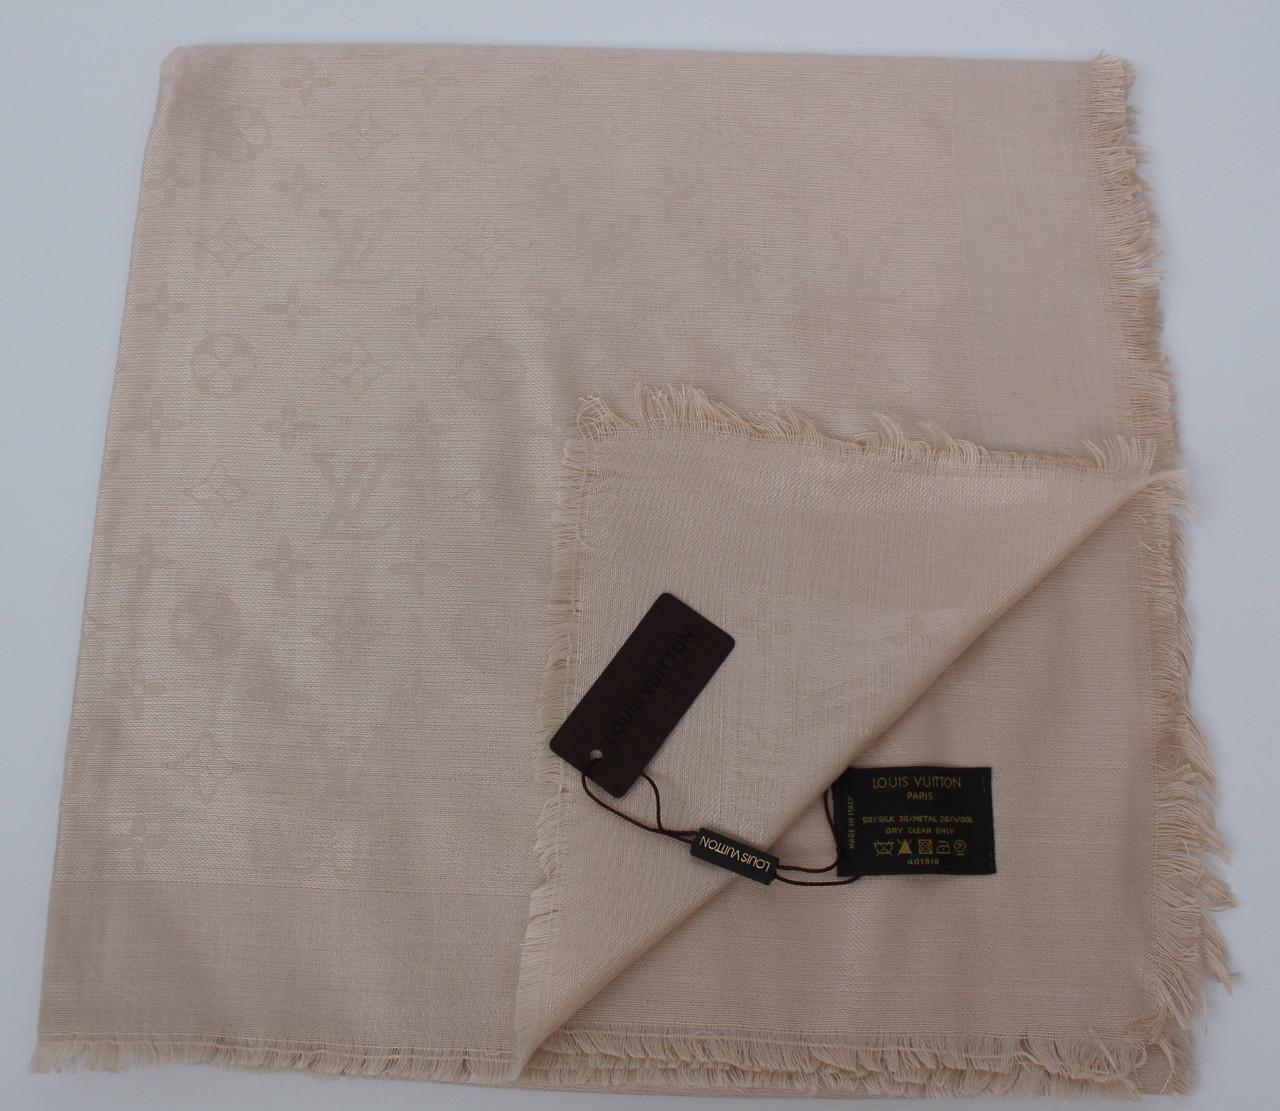 Хустка брендова Louis Vuitton 221-8